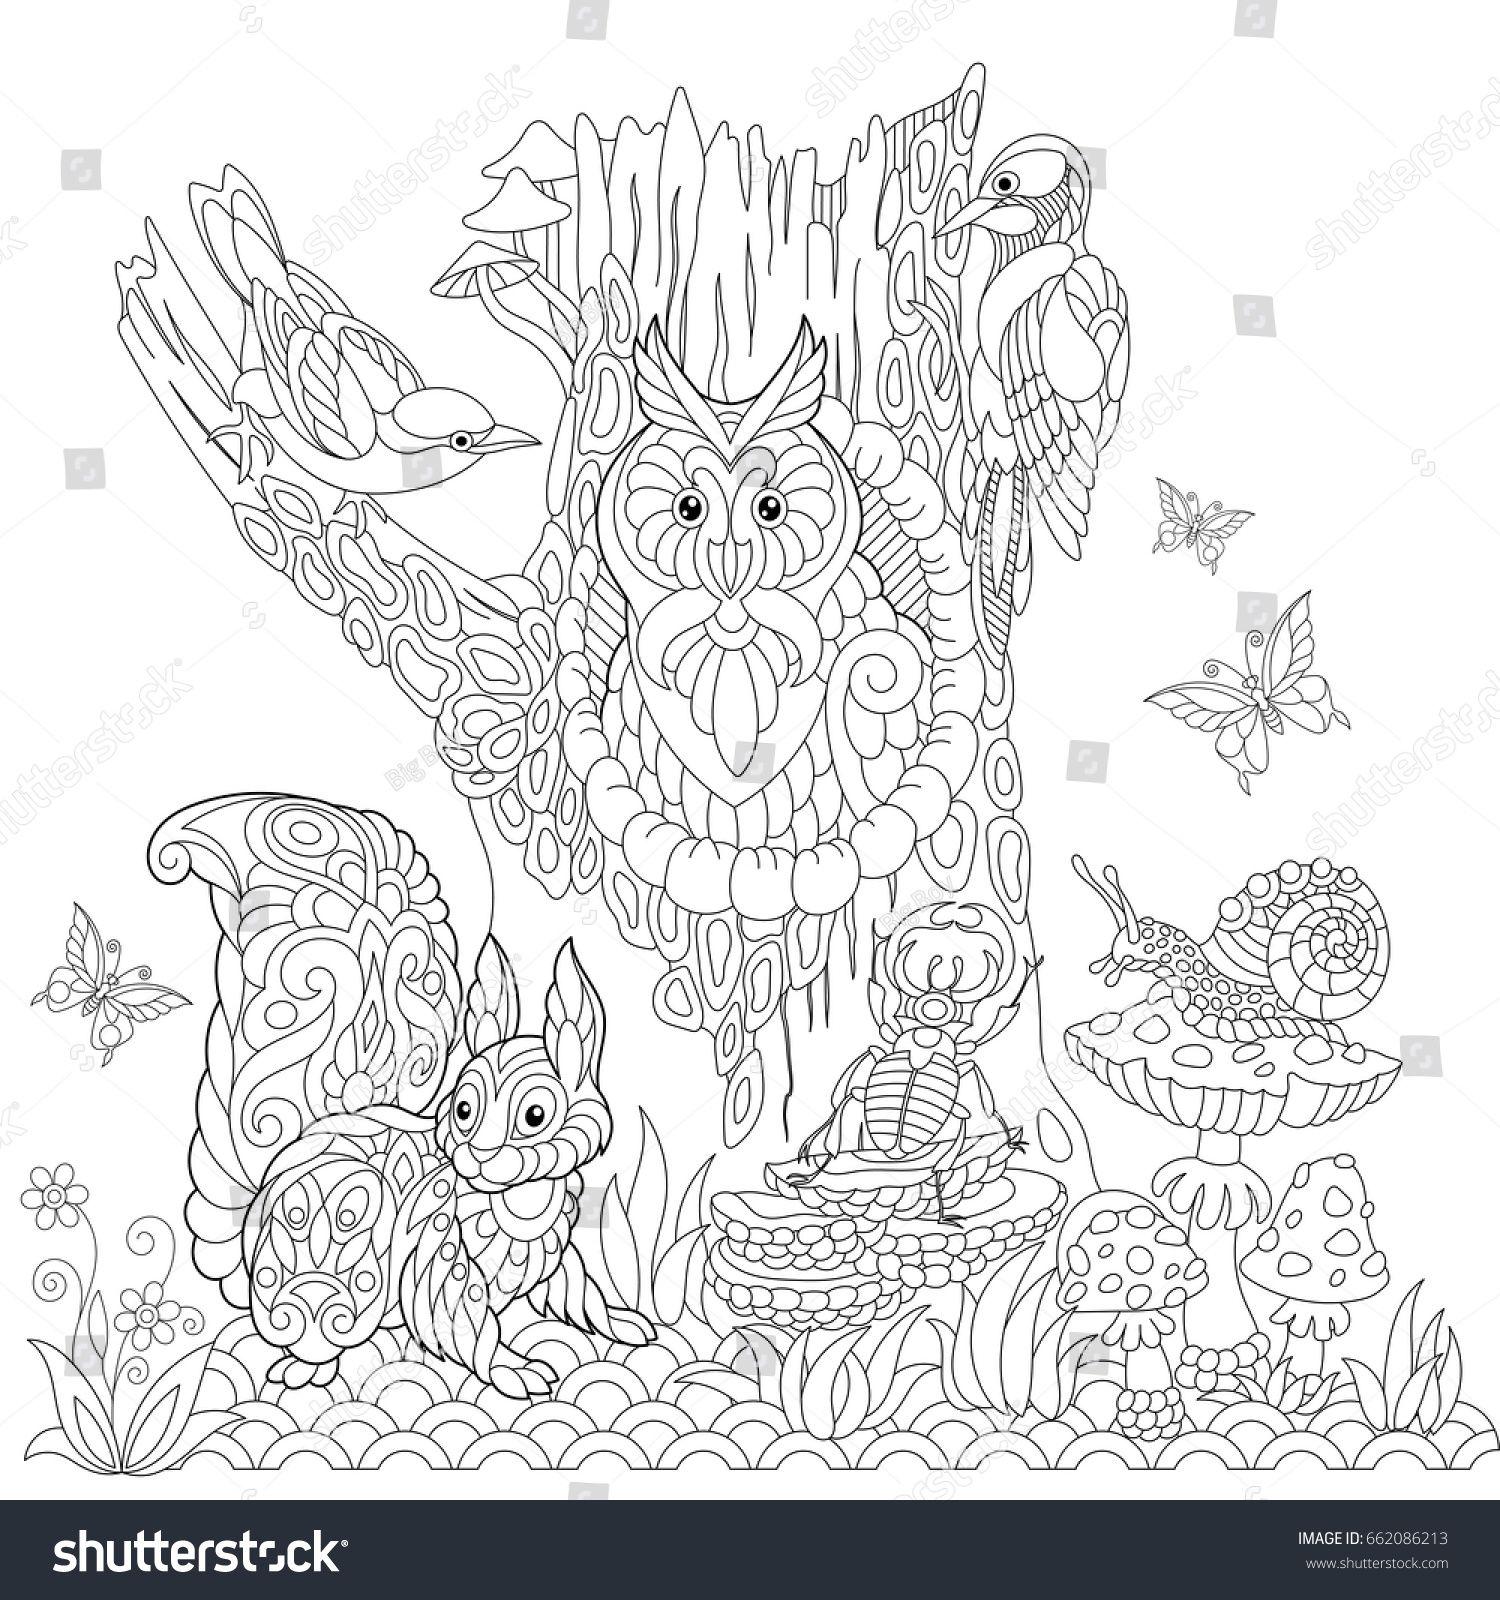 Coloring Book Page Of Forest Landscape Owl Cuckoo Bird Woodpecker Squirrel Snail Stag Beetle Butterflies Fre Coloriage Coloriage Hibou Livre De Couleur